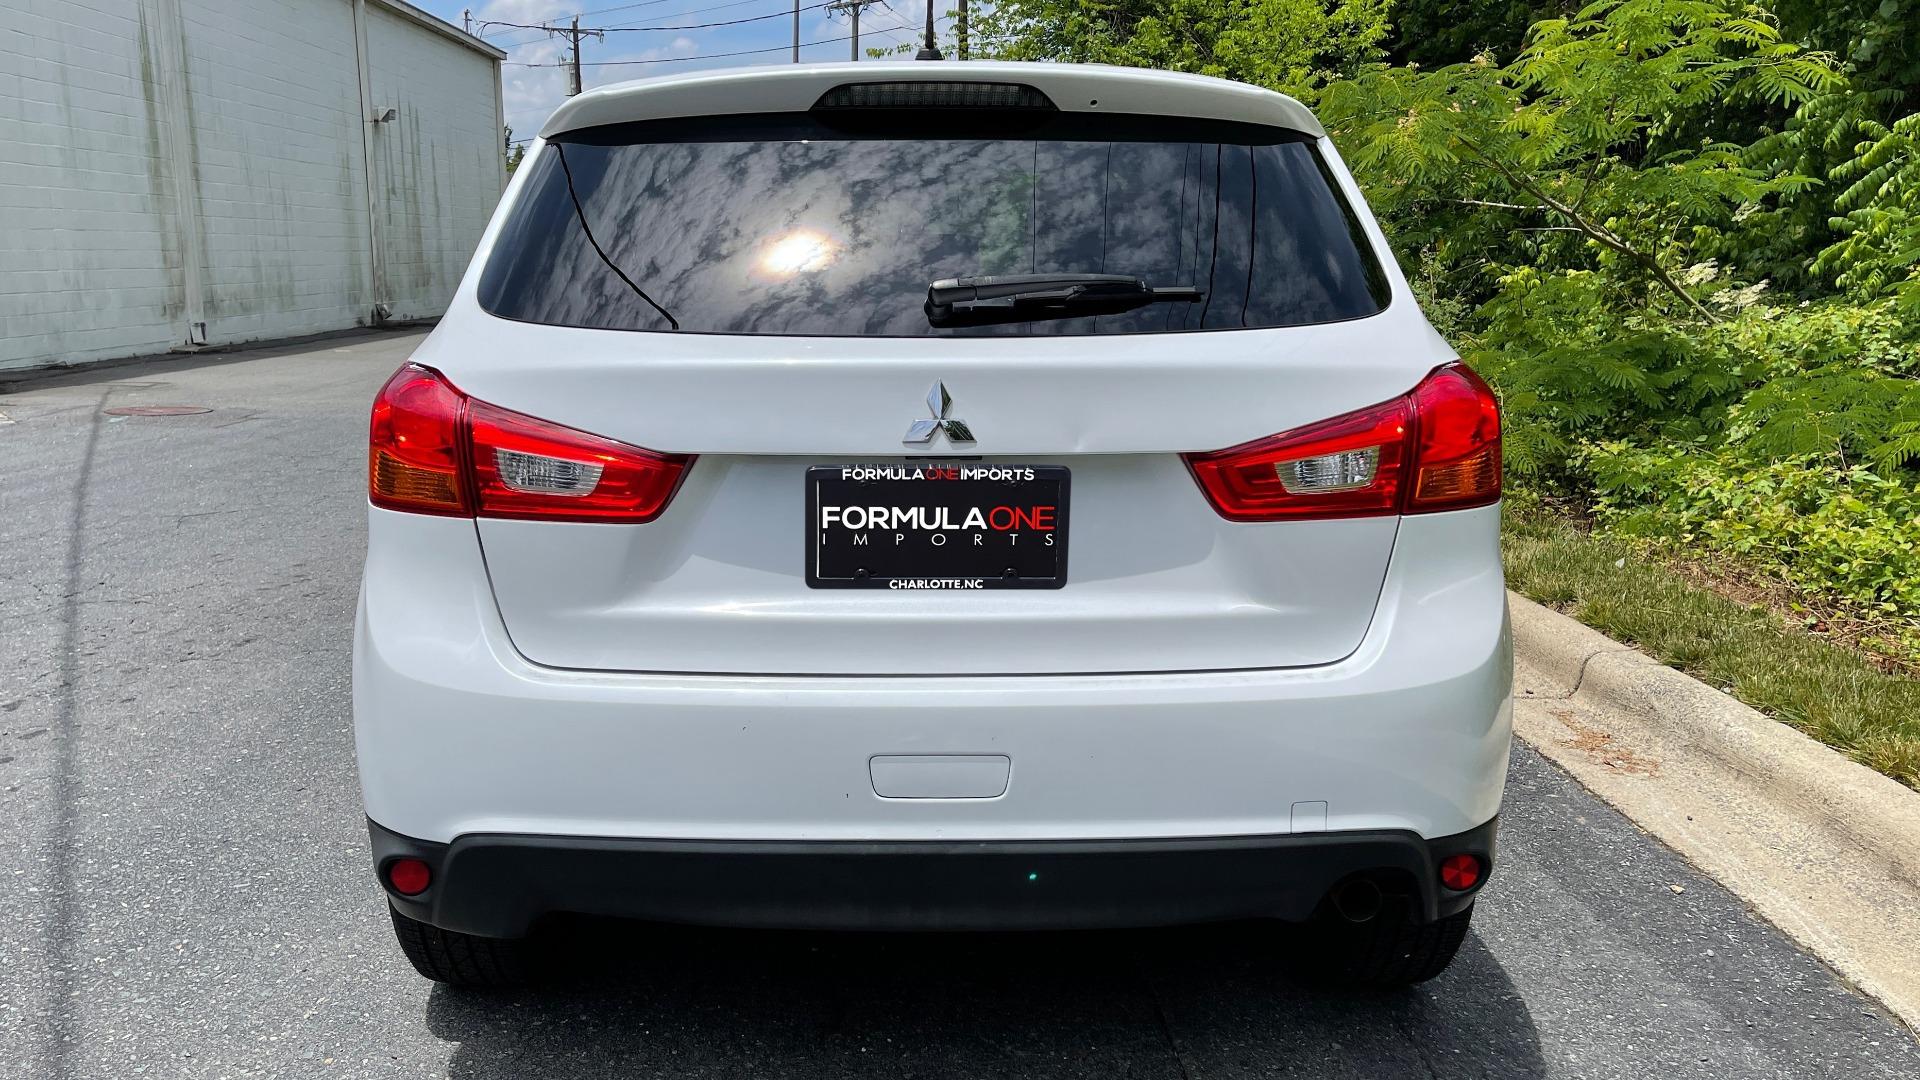 Used 2014 Mitsubishi OUTLANDER SPORT ES 2WD / 2.0L / CVT TRANS / 18IN WHEELS / 31MPG for sale $8,495 at Formula Imports in Charlotte NC 28227 7